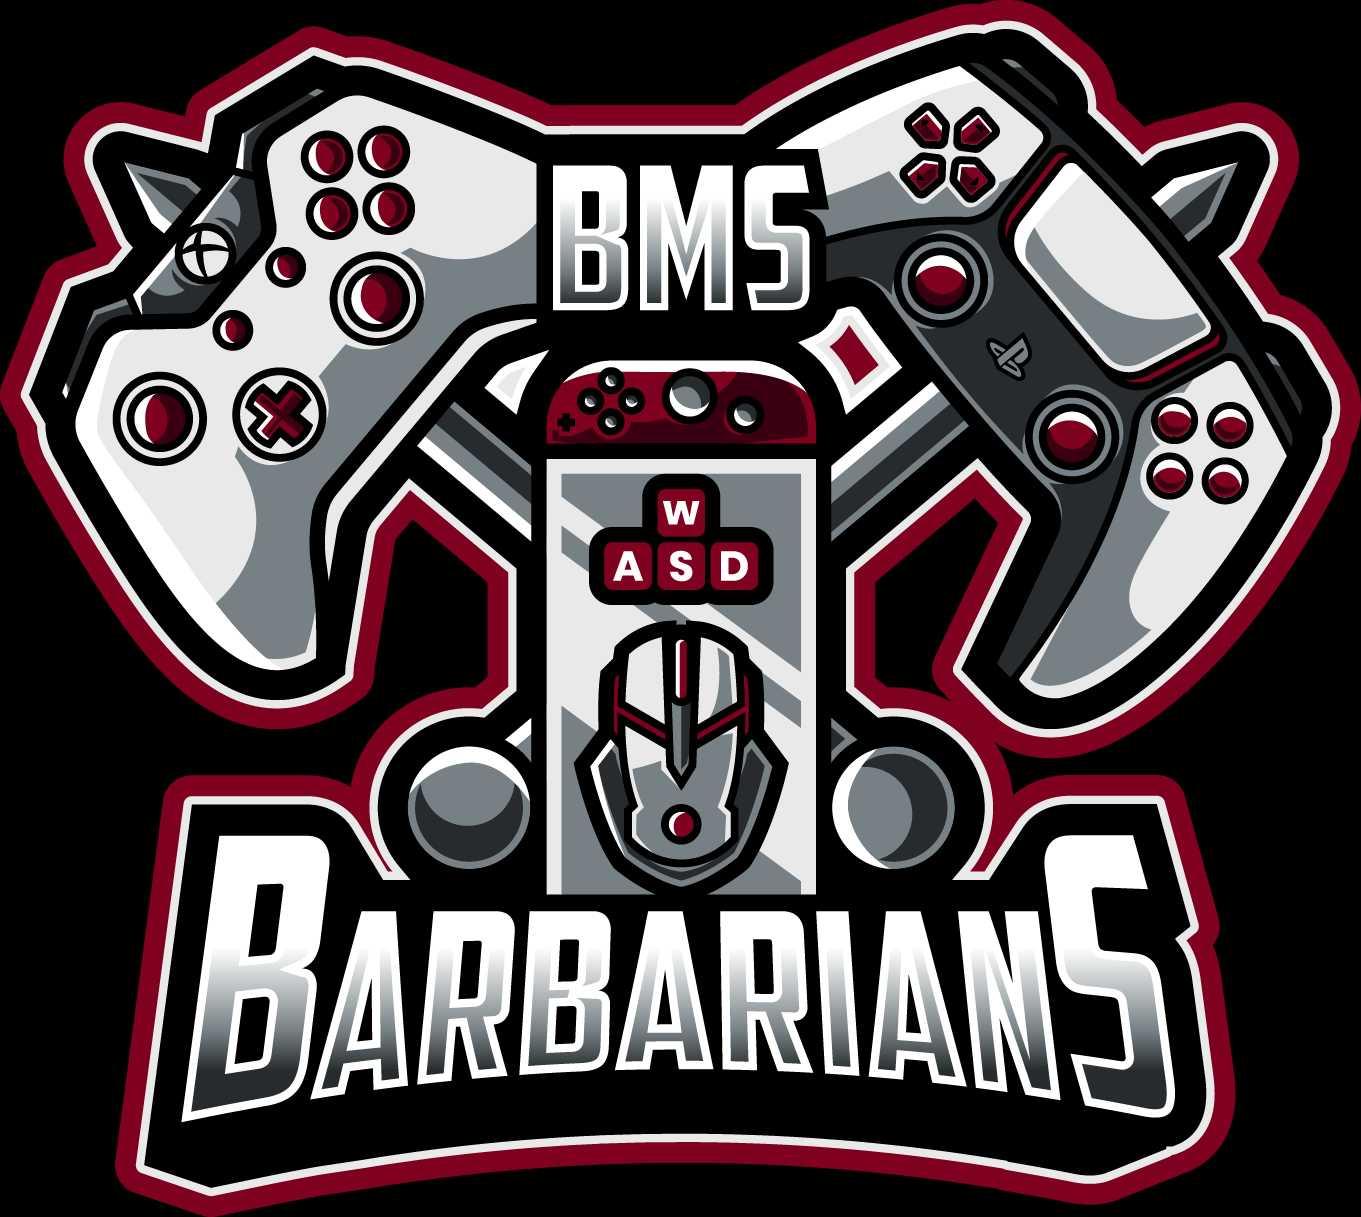 Burnet Barbarians's logo